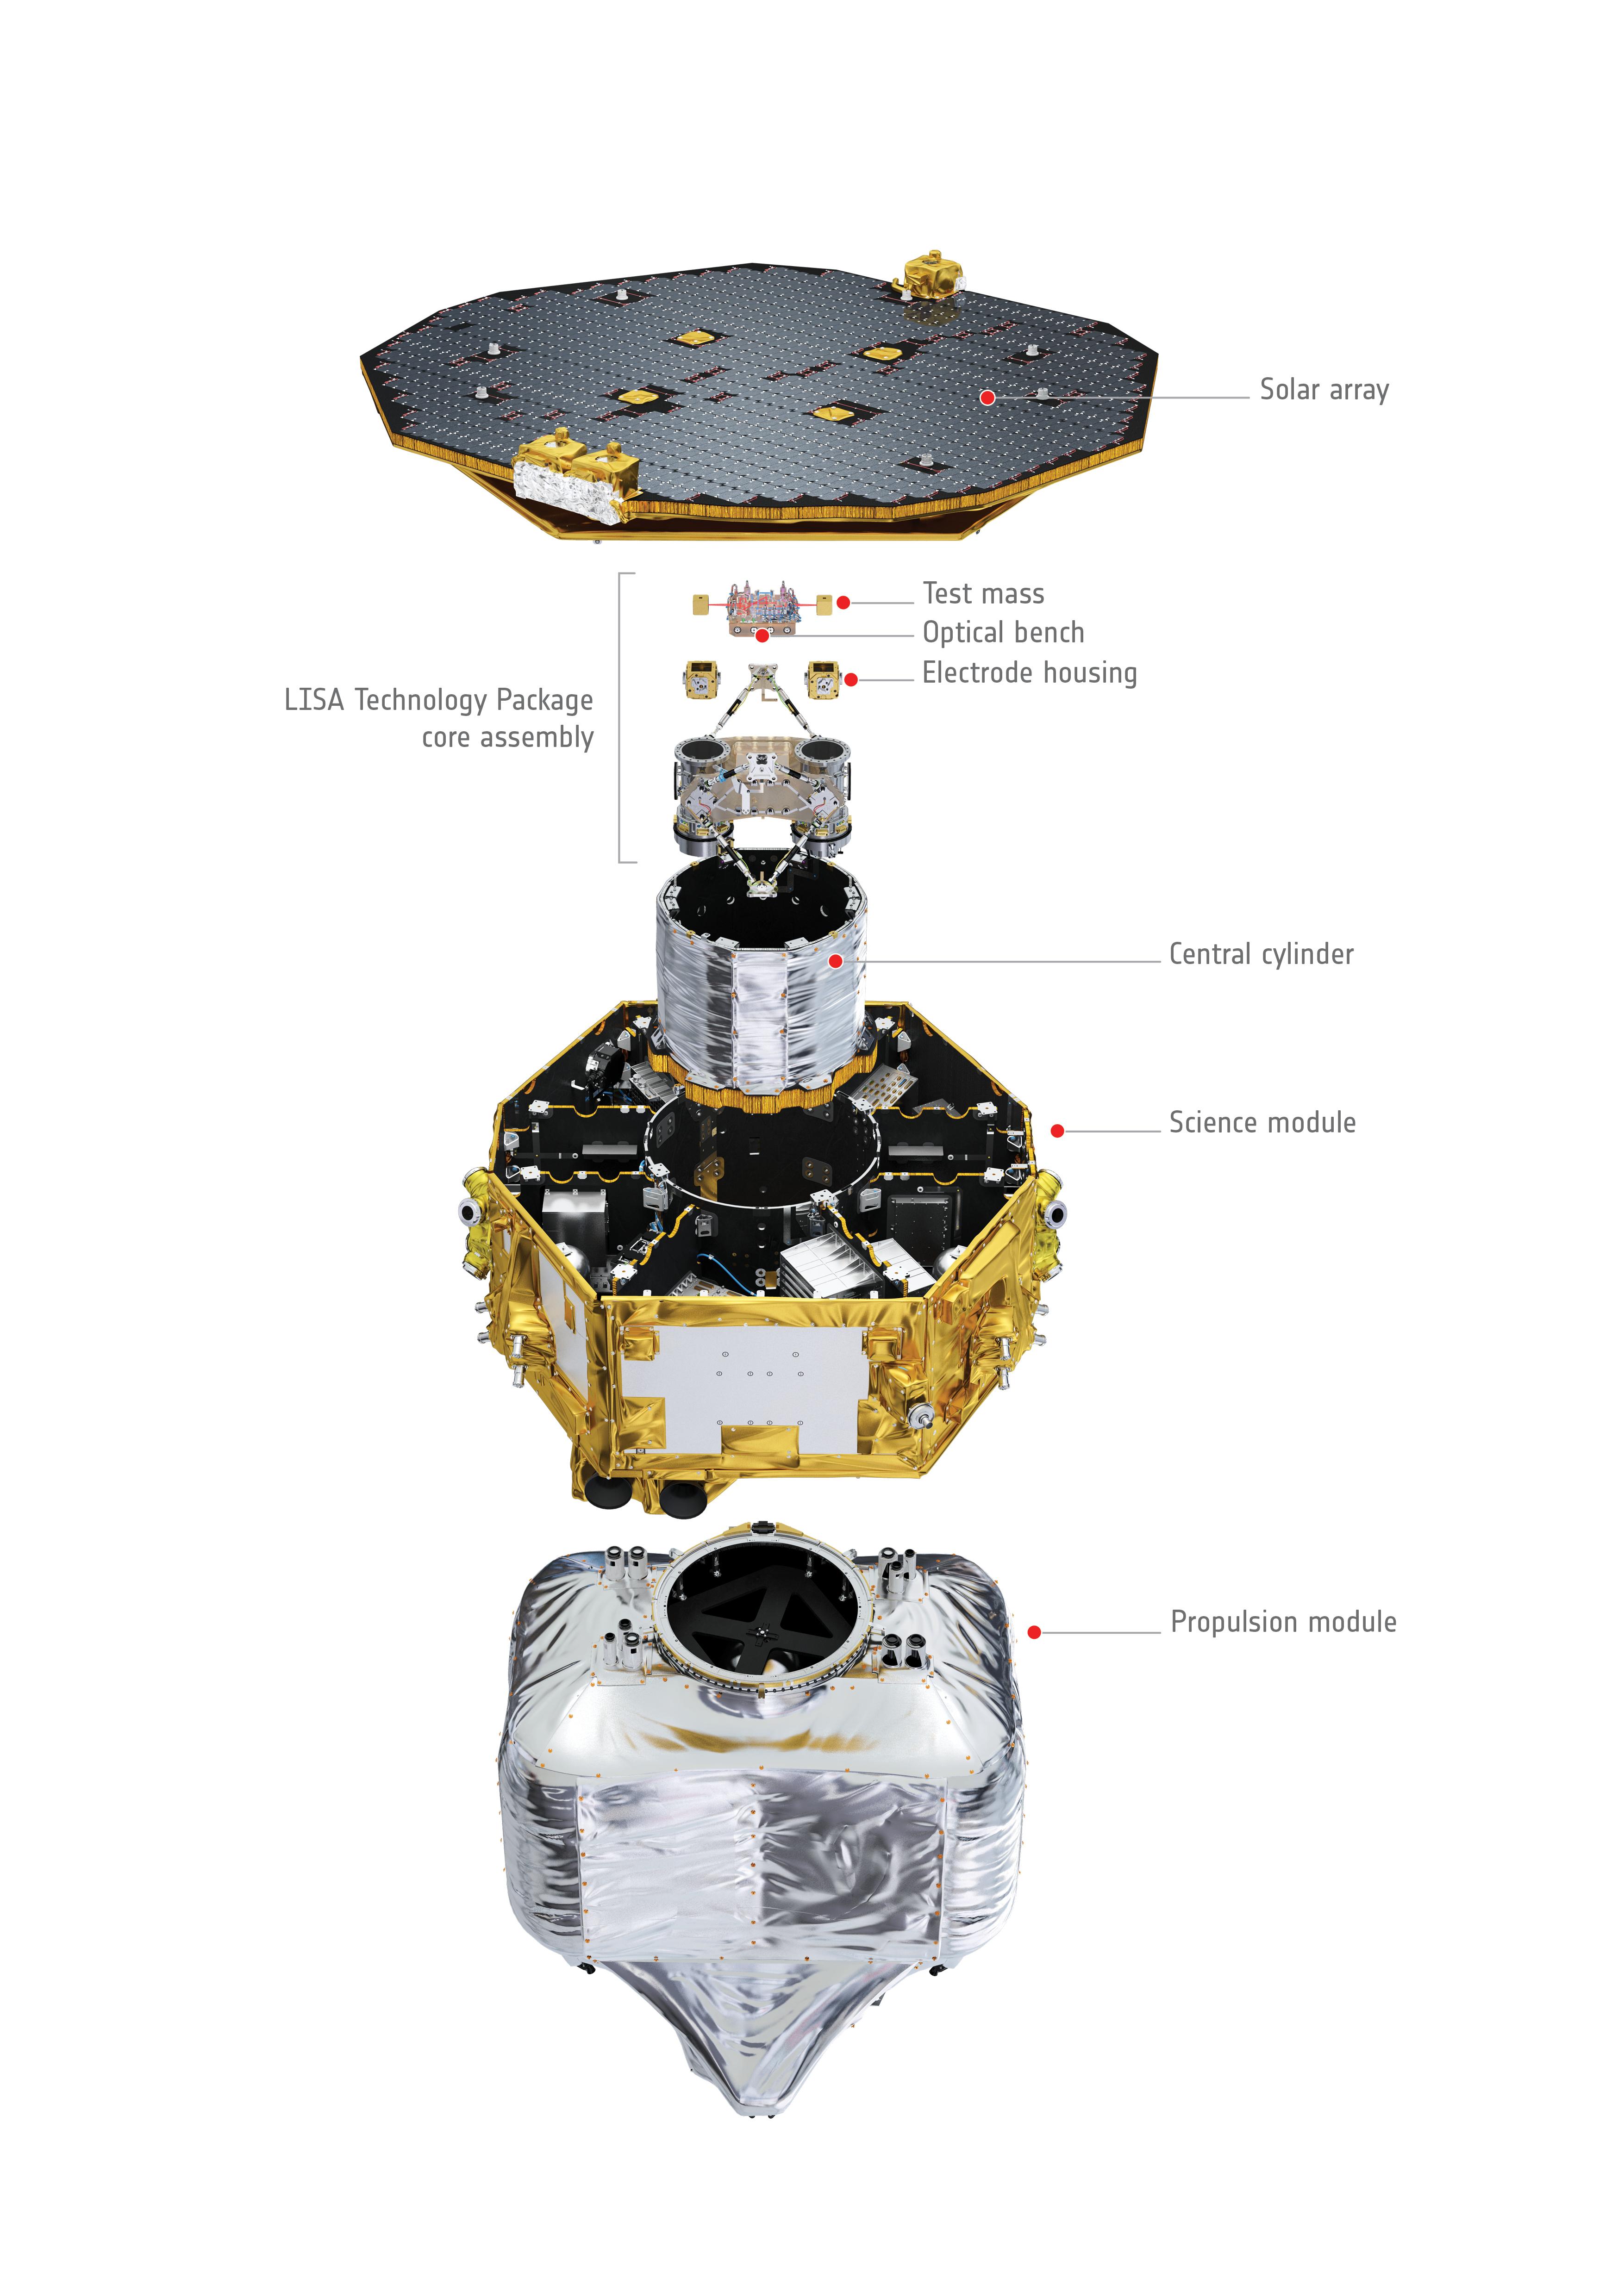 1567215795555-ESA_LISA_Pathfinder_ExplodedView_Annotated.jpg